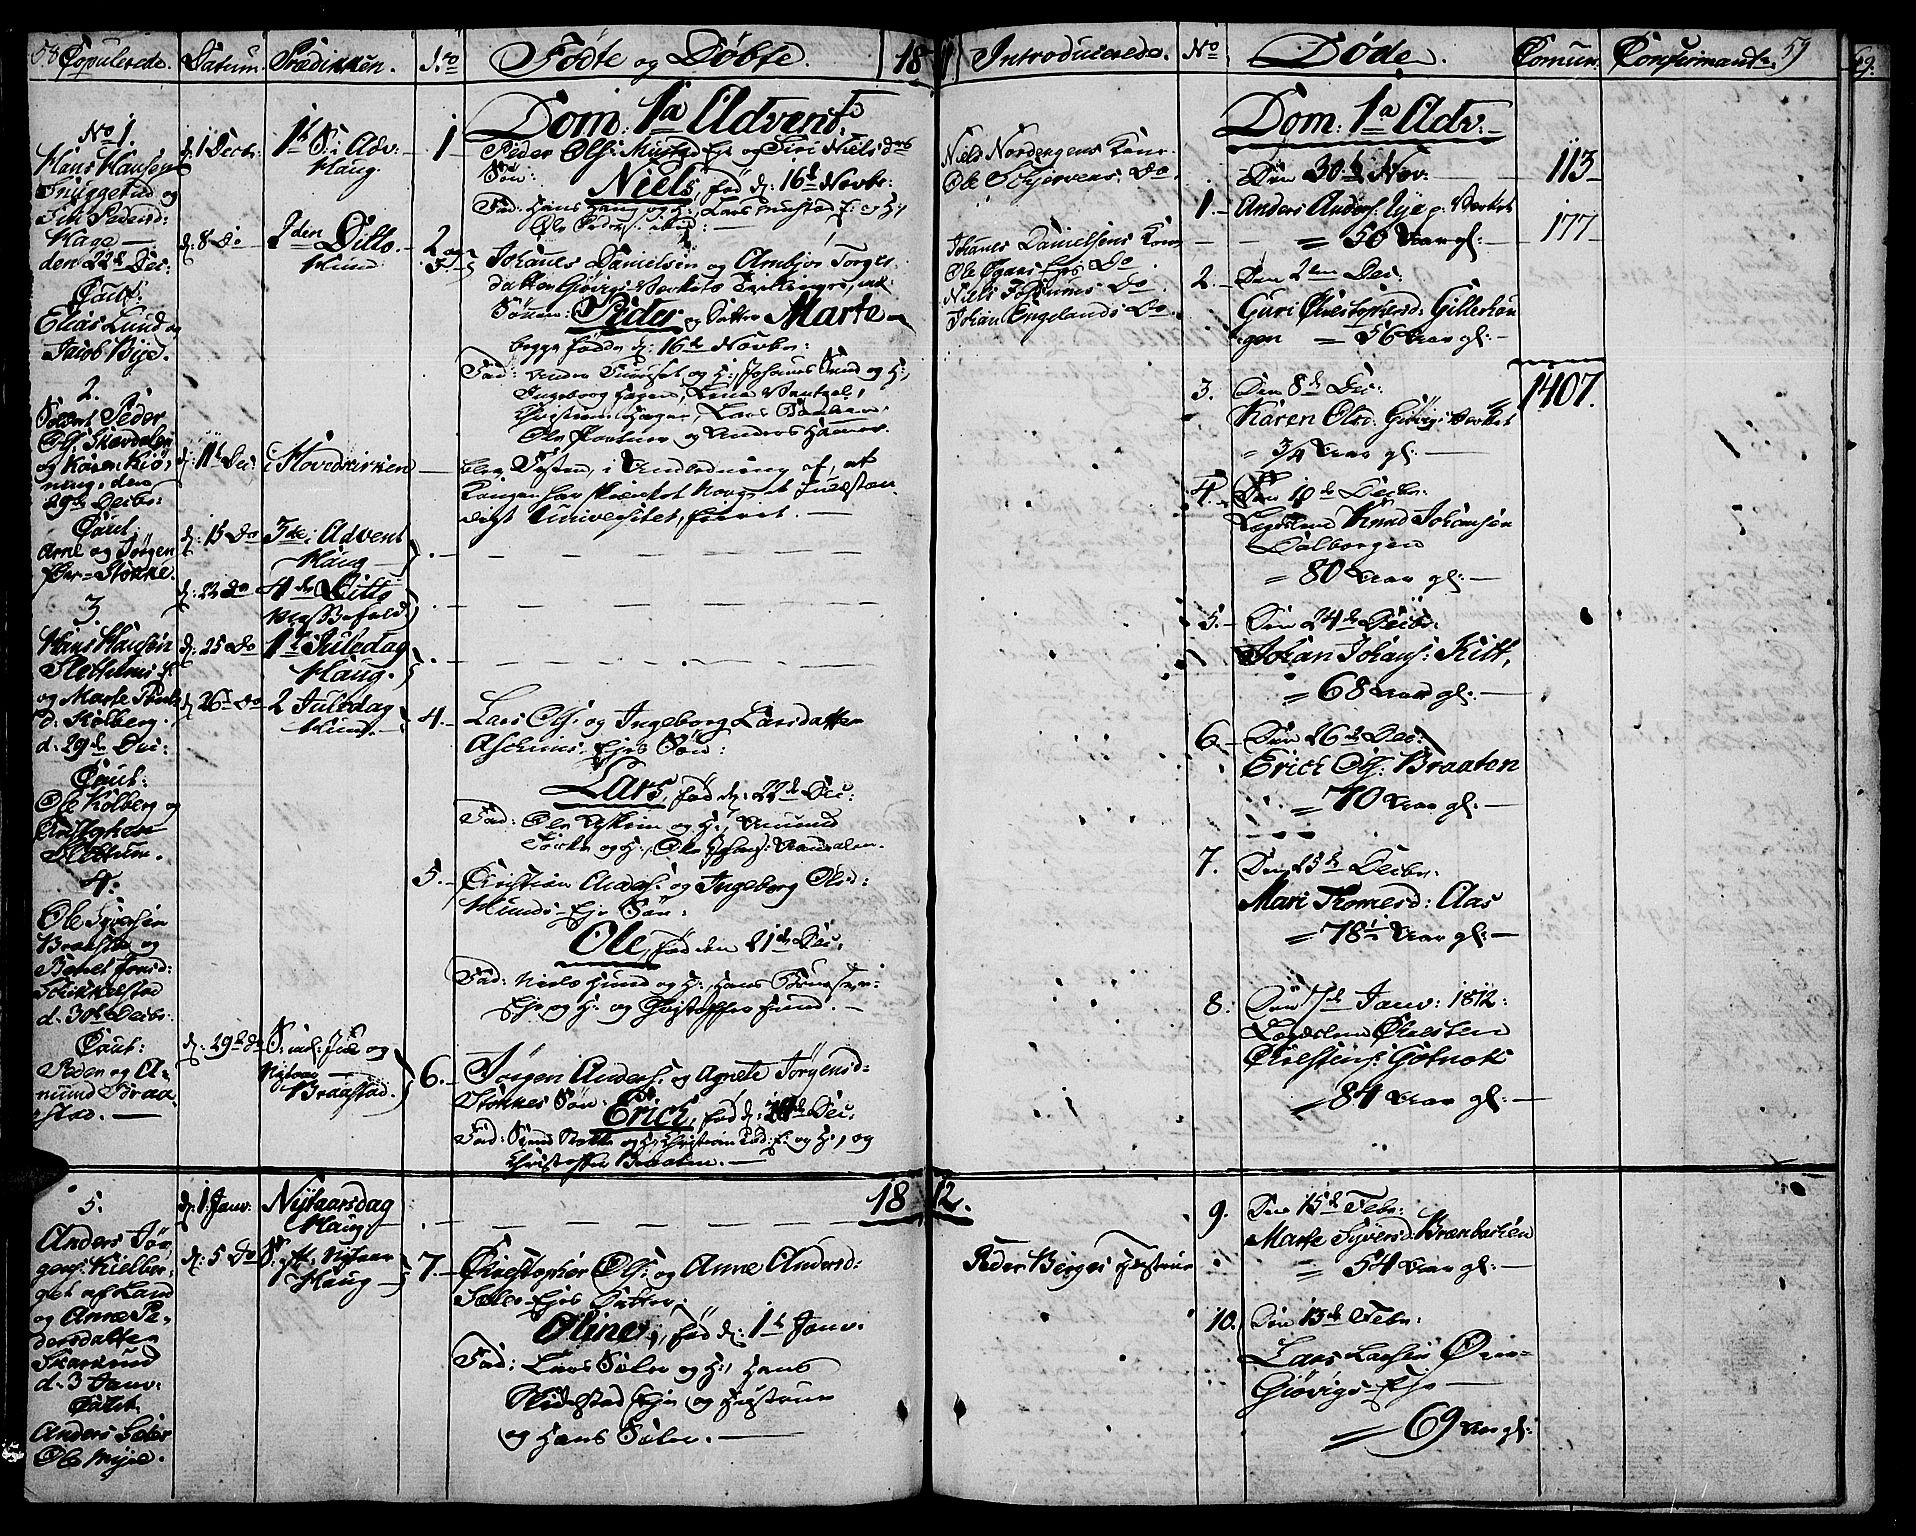 SAH, Vardal prestekontor, H/Ha/Haa/L0003: Ministerialbok nr. 3, 1808-1814, s. 58-59